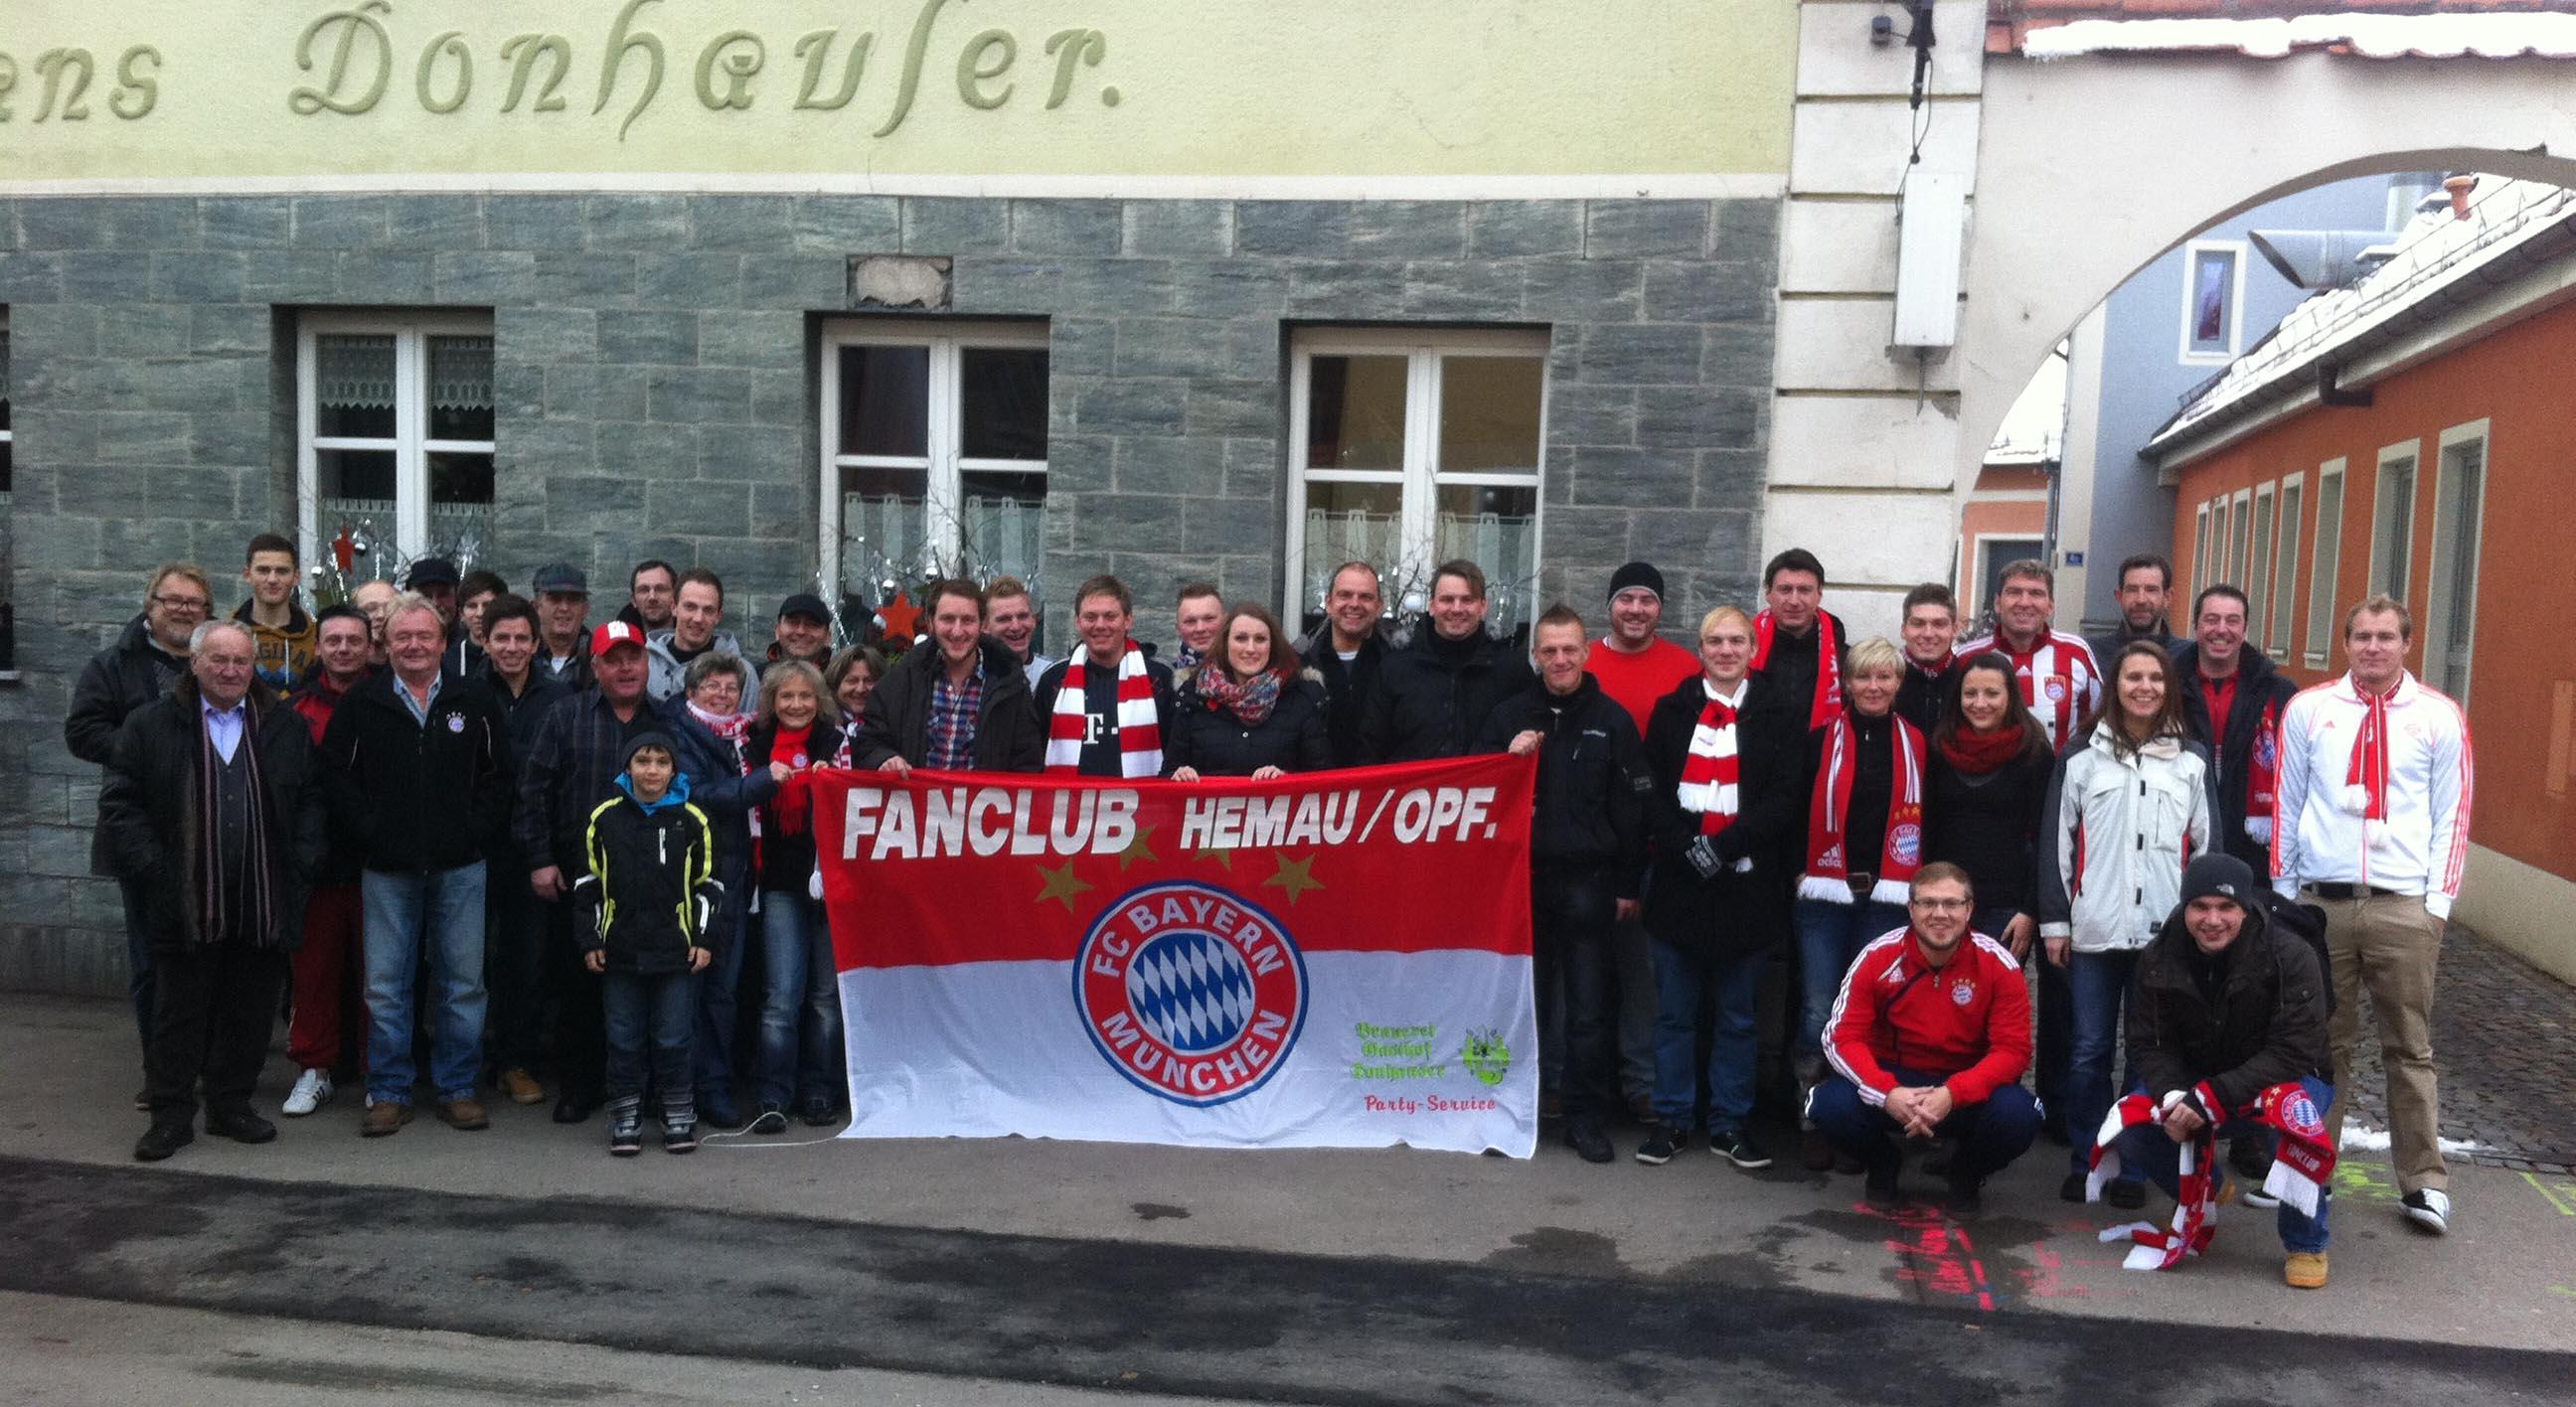 FCB_BVB-2012a